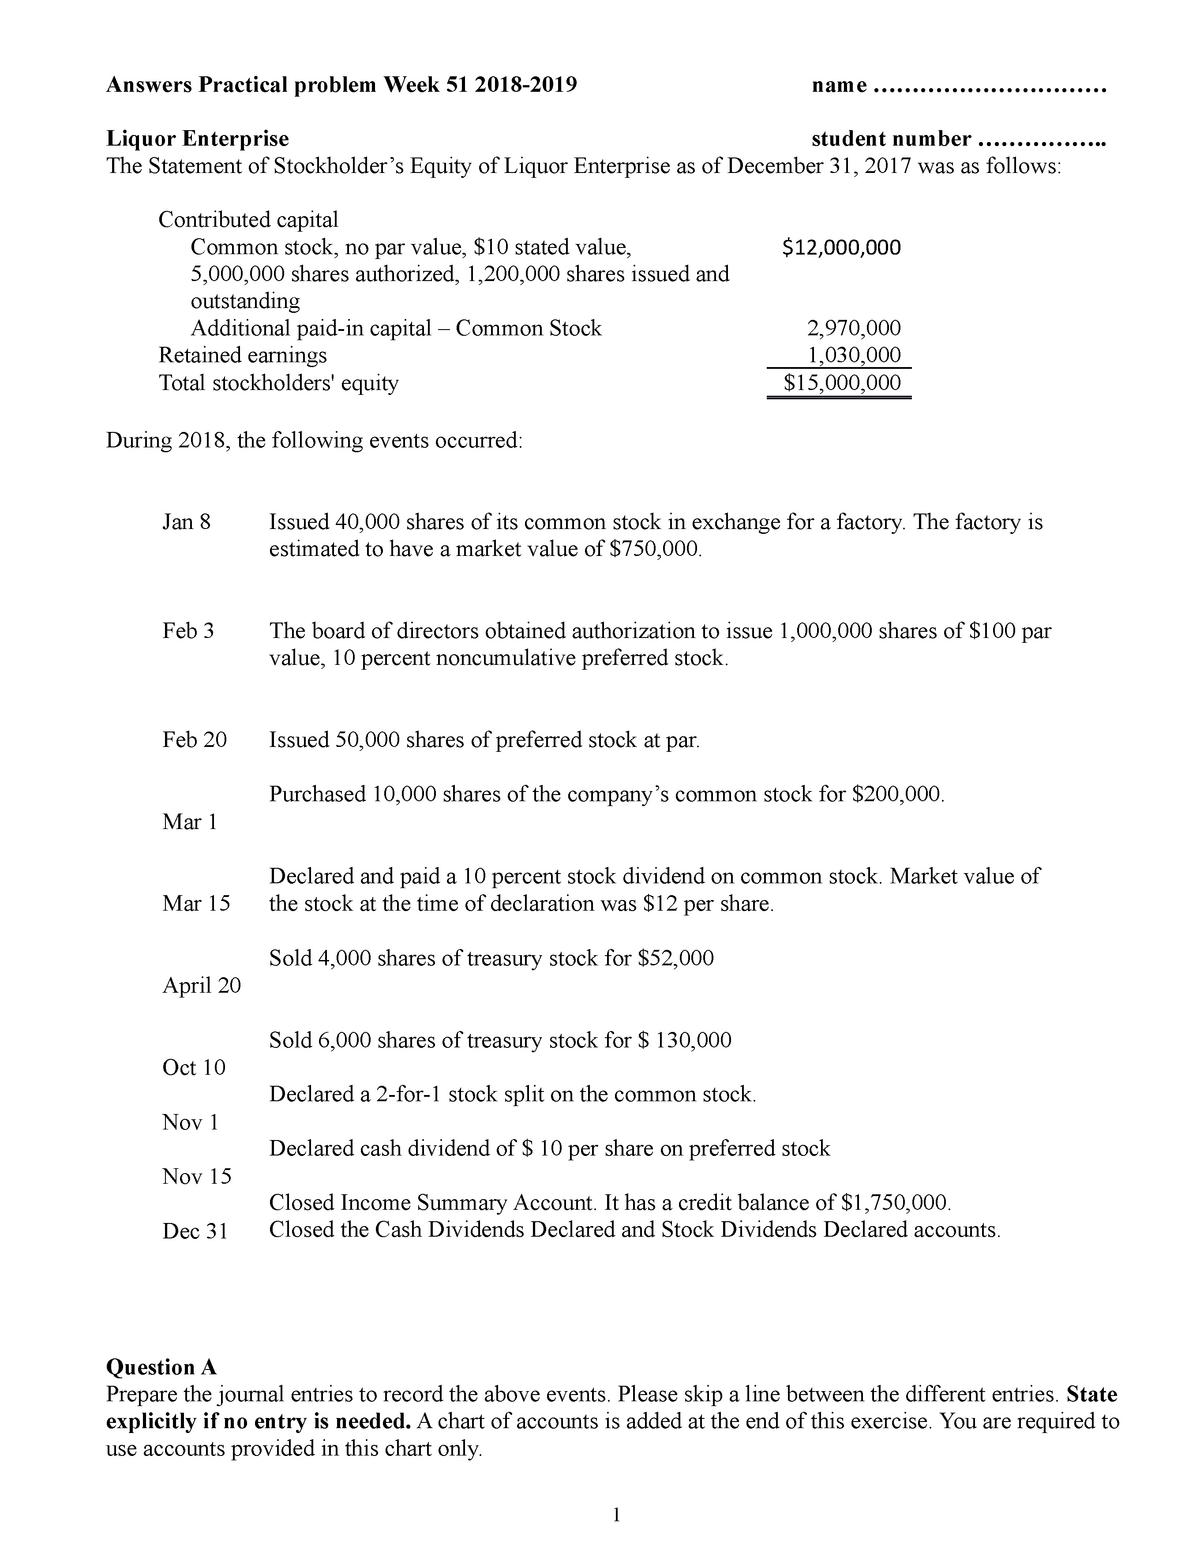 Practicalweek 51-1819answers - EBP030A05: Financial